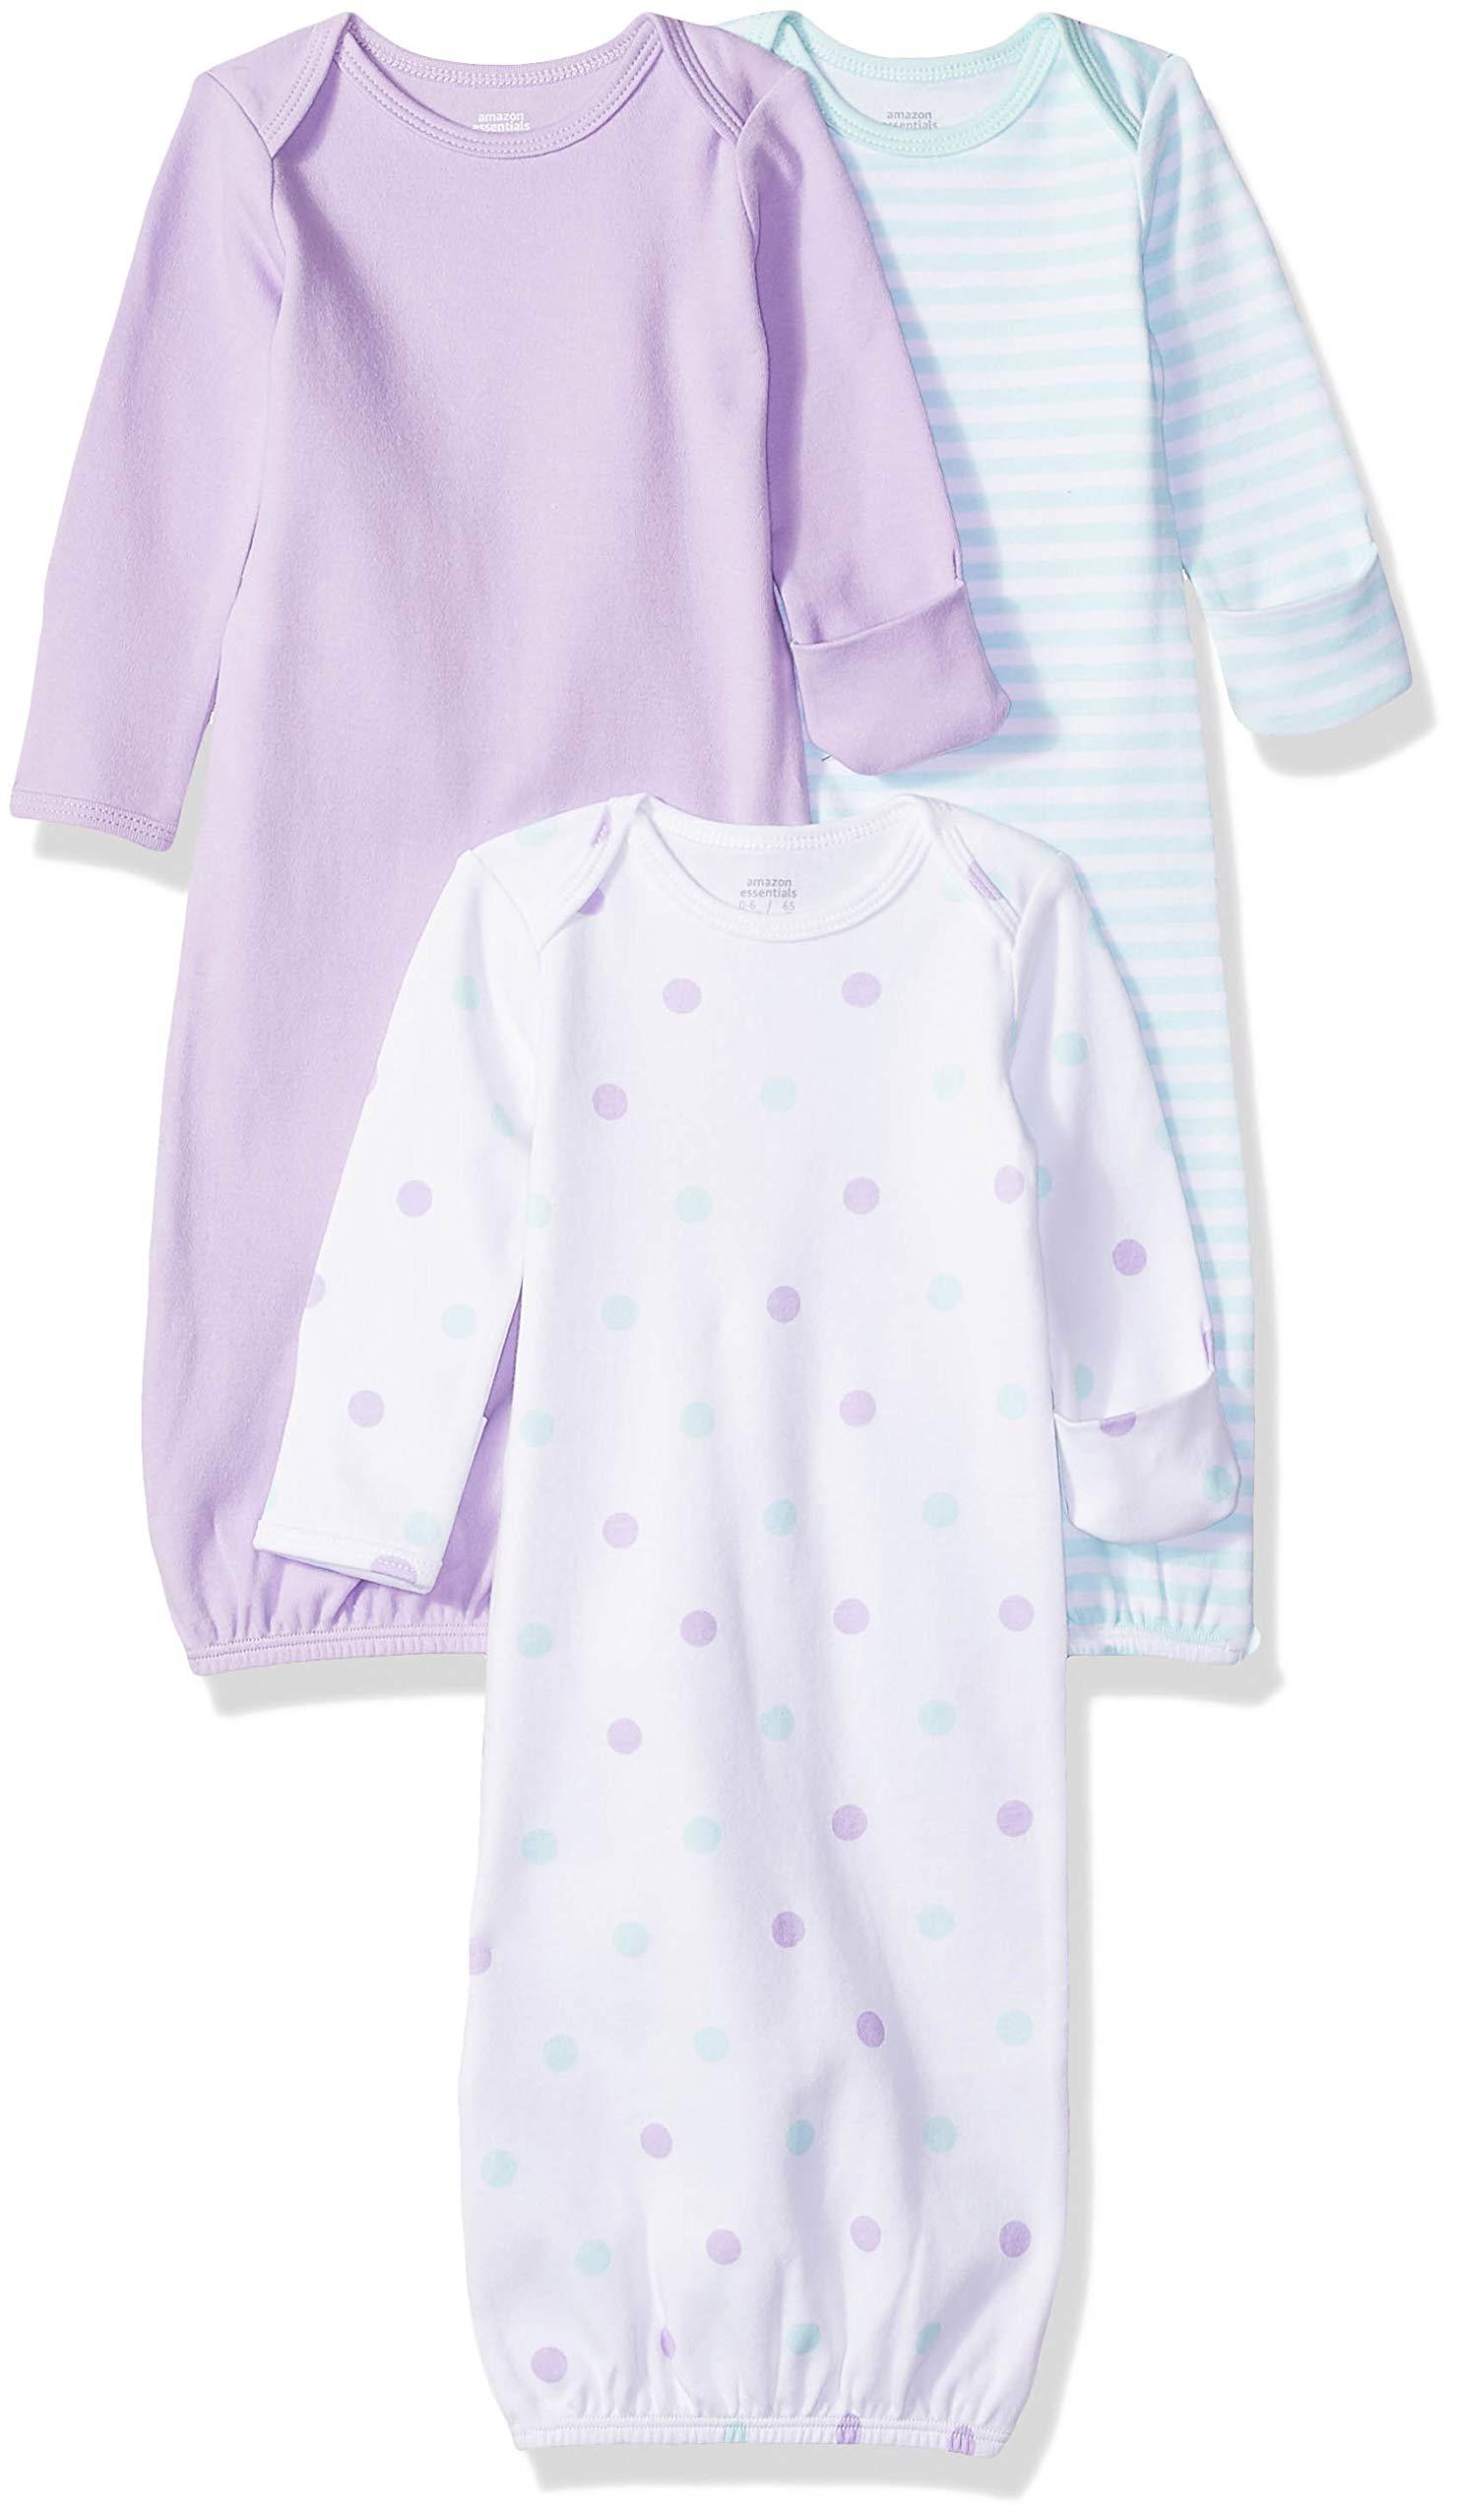 Amazon Essentials Baby Girls 3-Pack Sleeper Gown, Dots, 0-6M